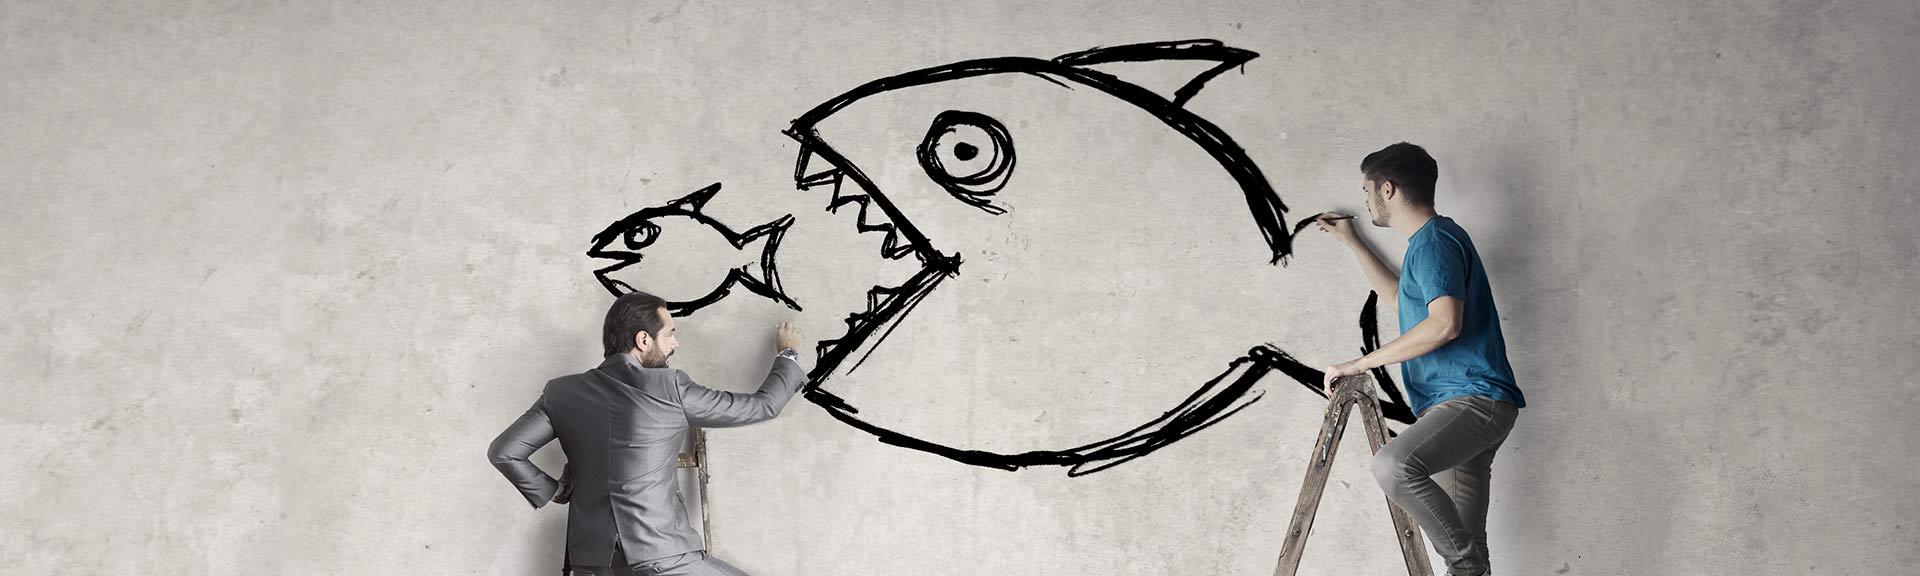 Digital Marketing Shark Eats Small Fish